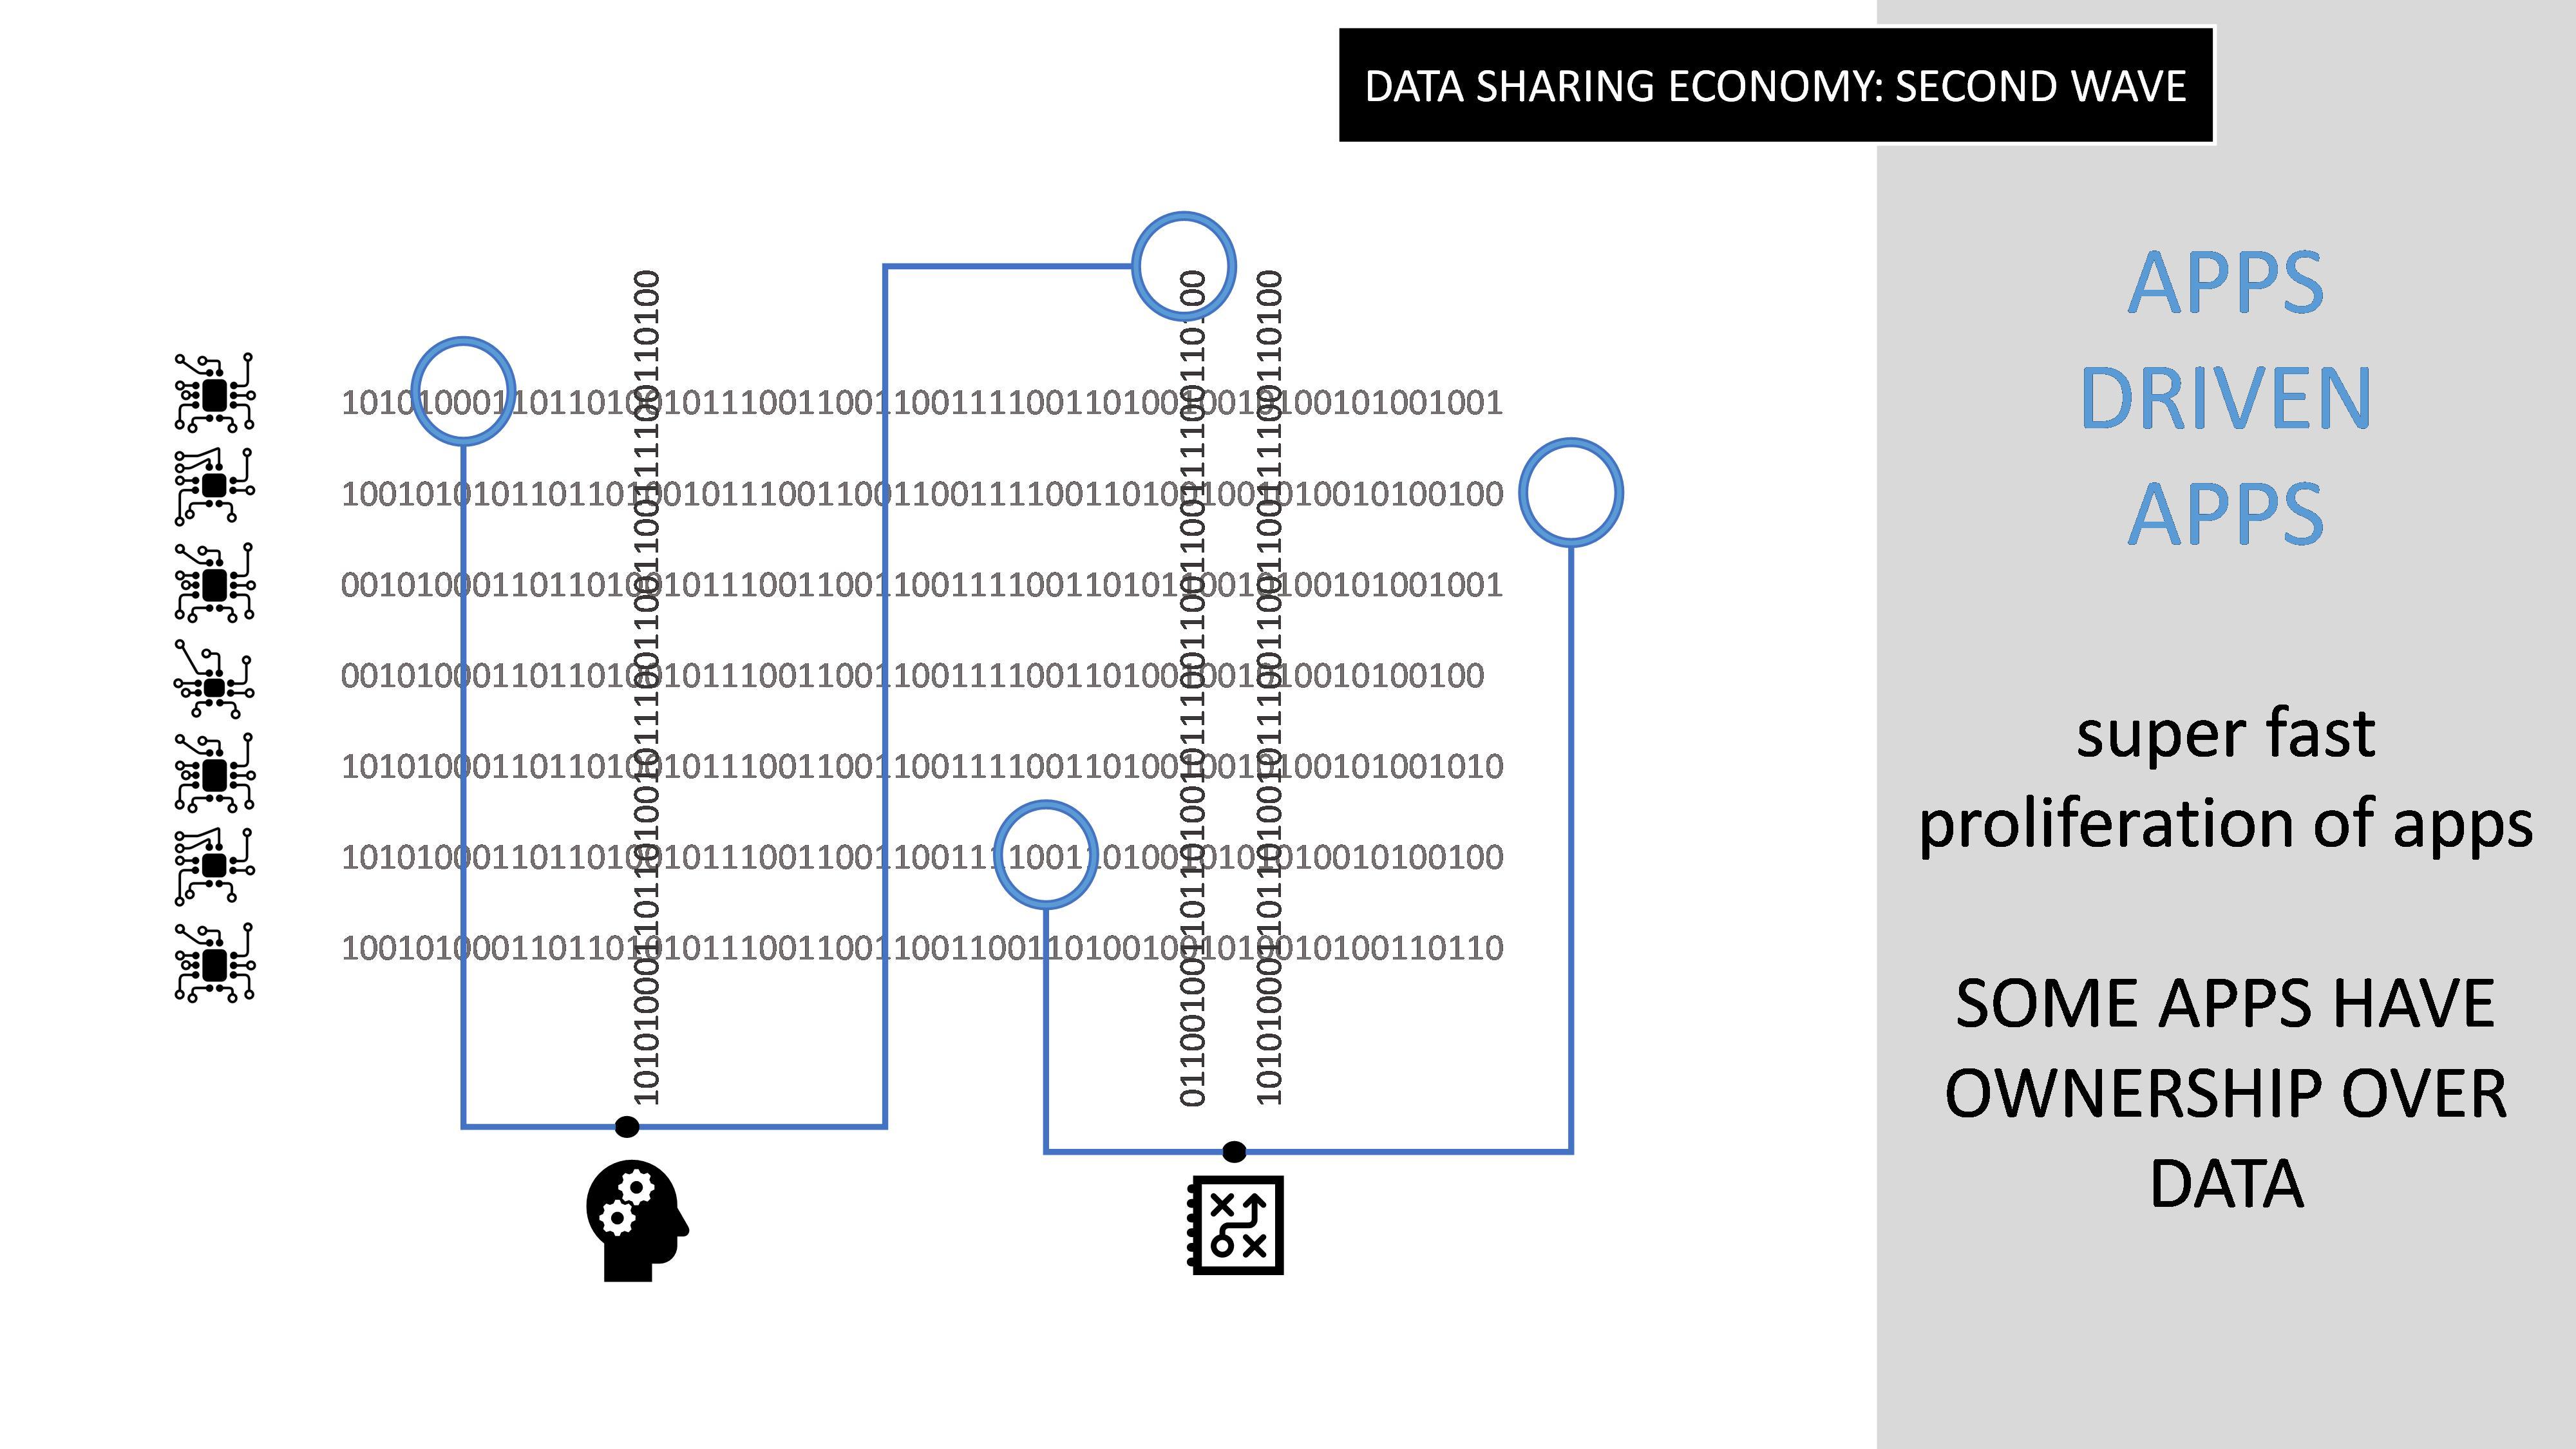 Data Sharing Economy second wave